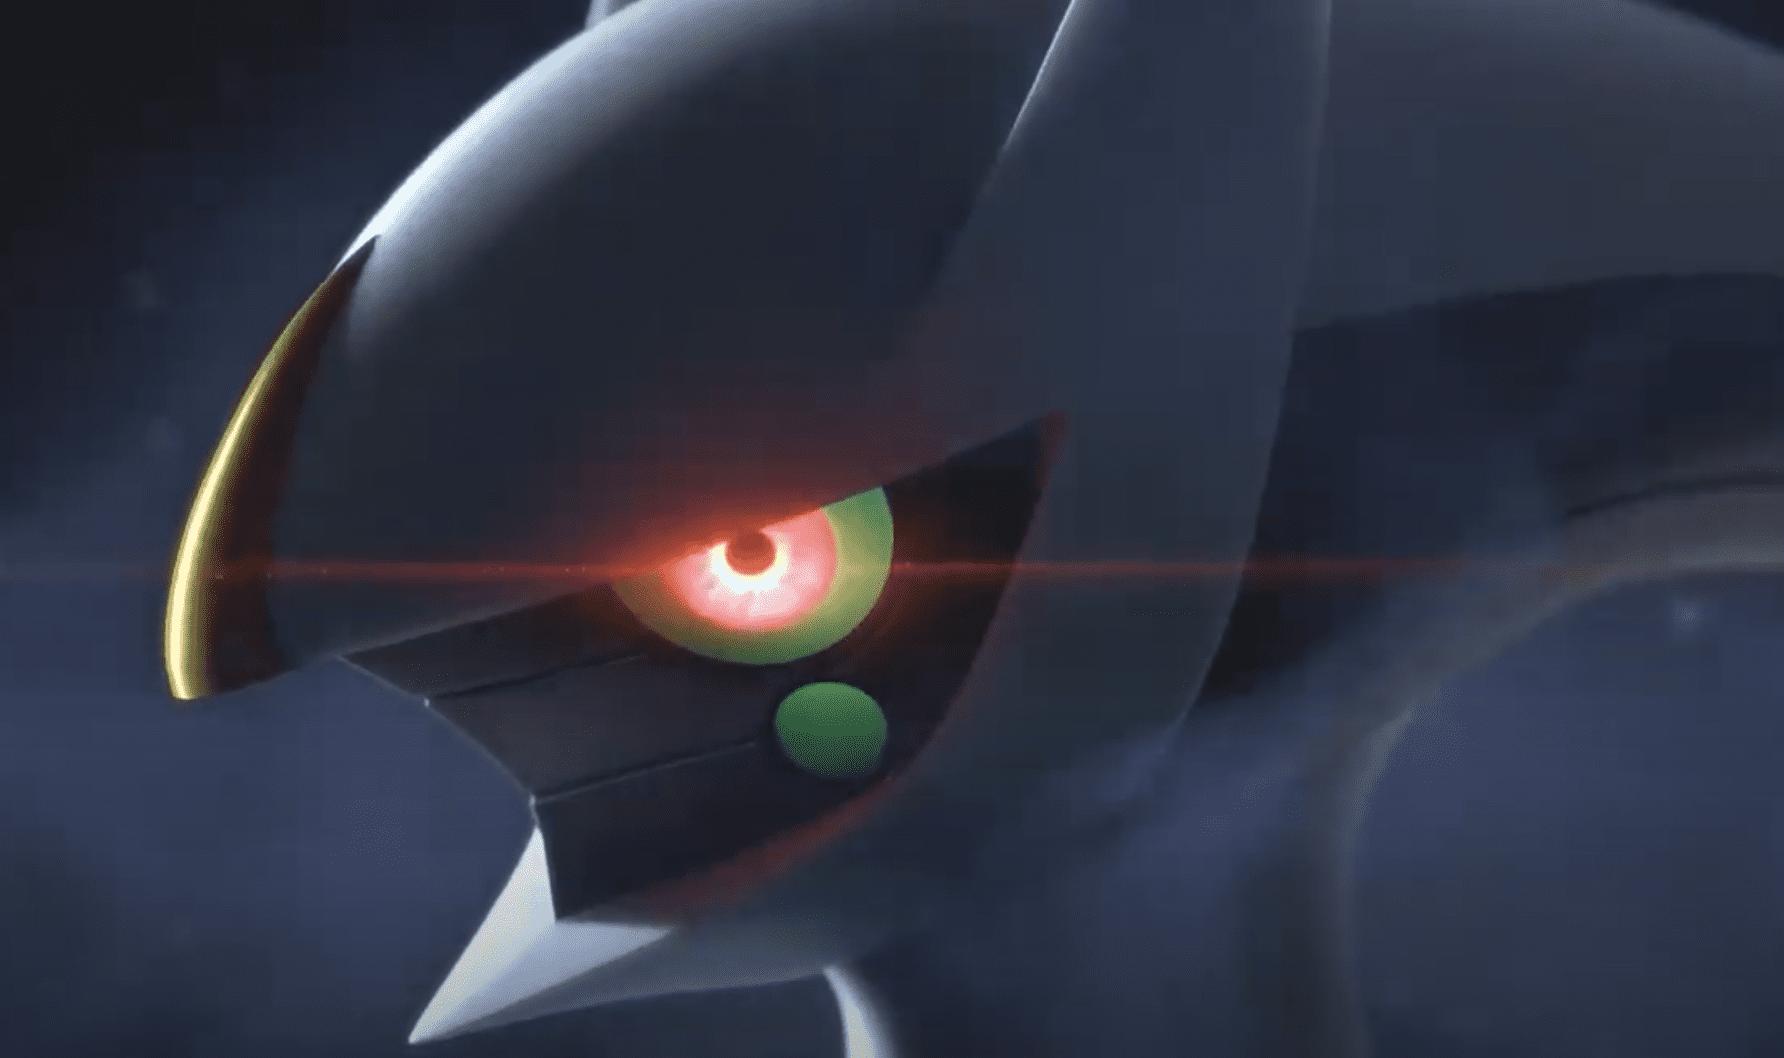 Pokemon Legends Arceus Revealed With New Trailer, Video